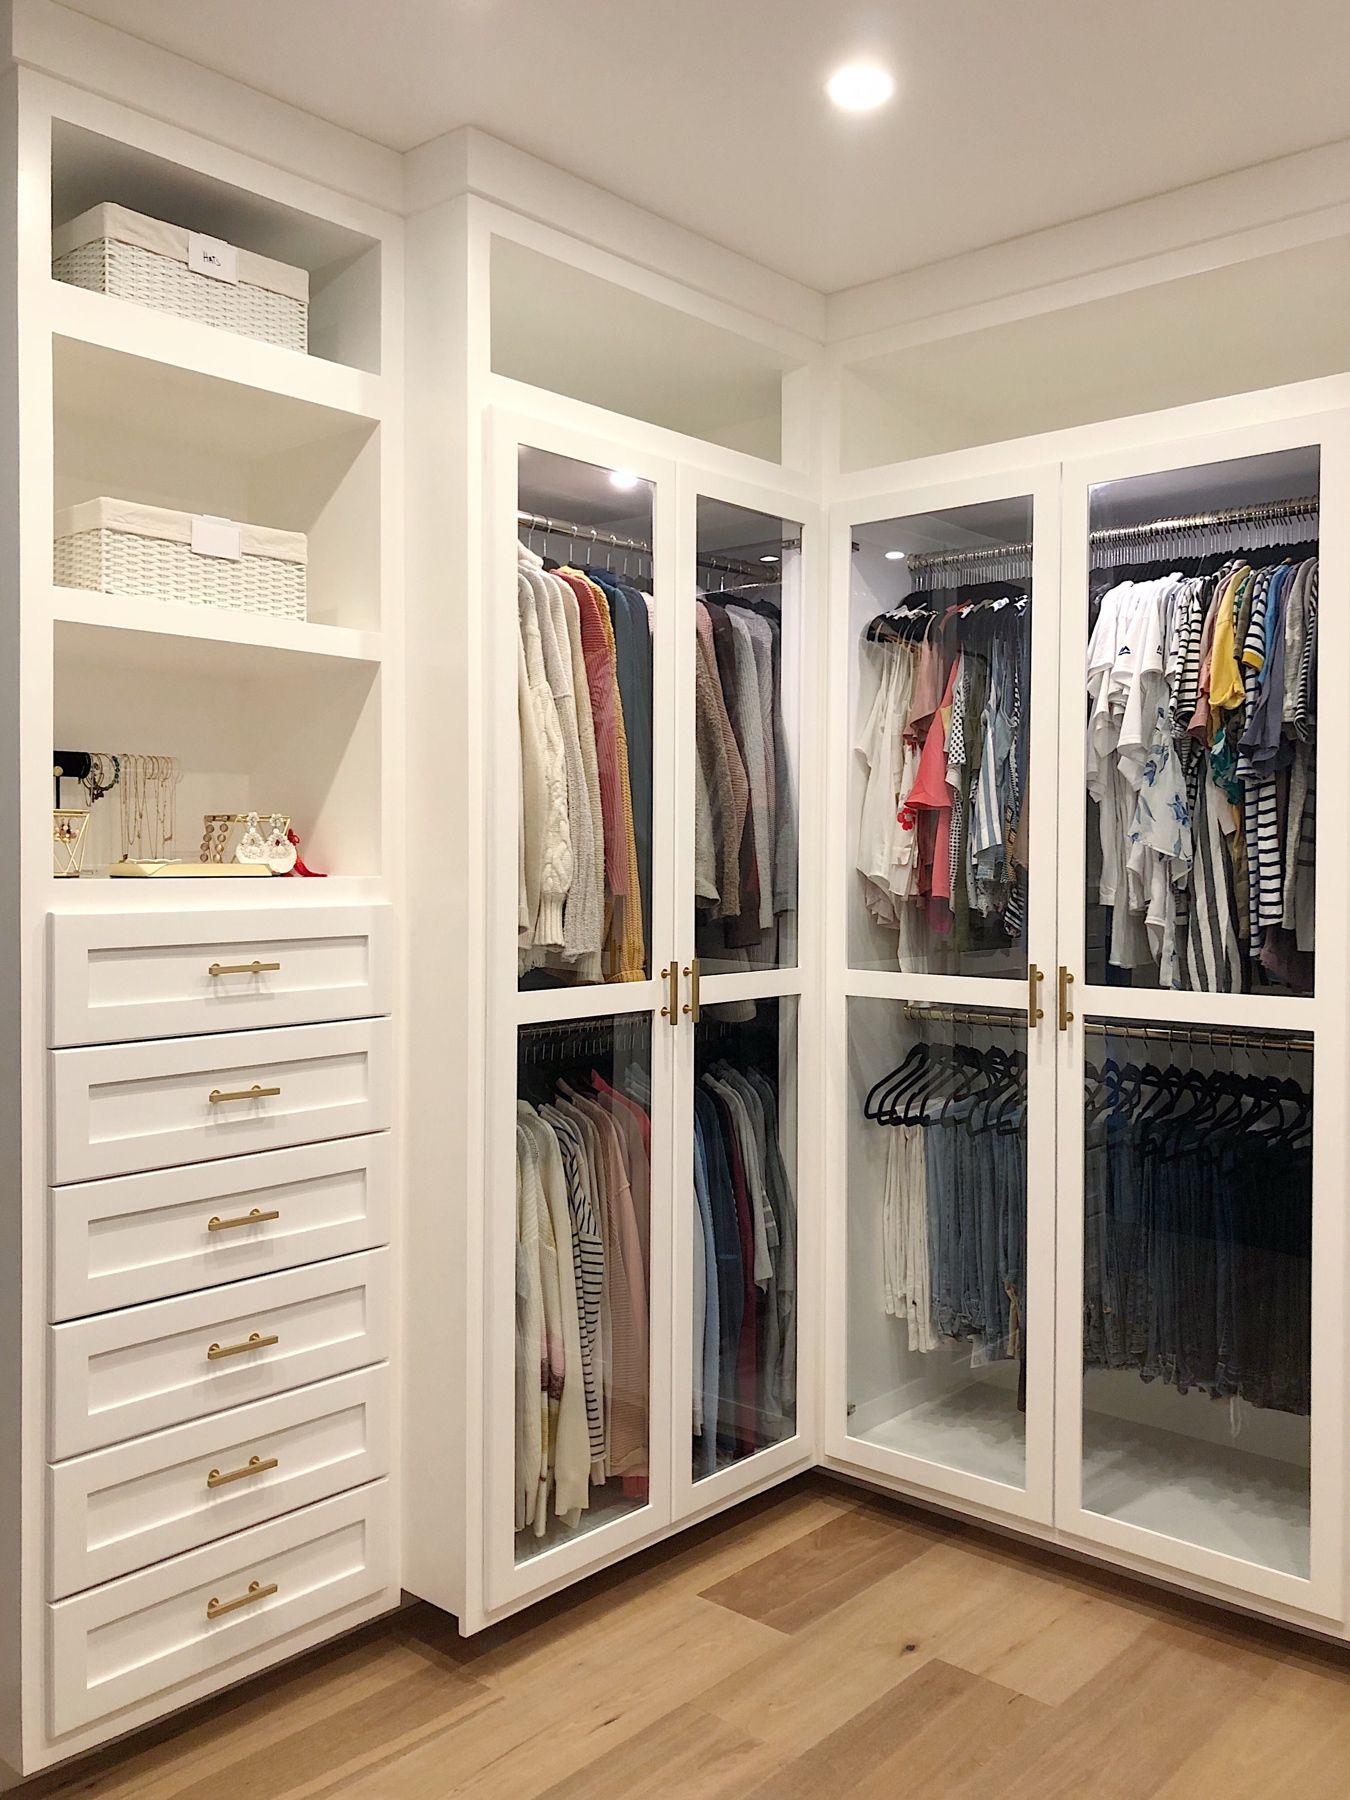 Neat Method Closets Closet Ideas Closet Storage Closet Design